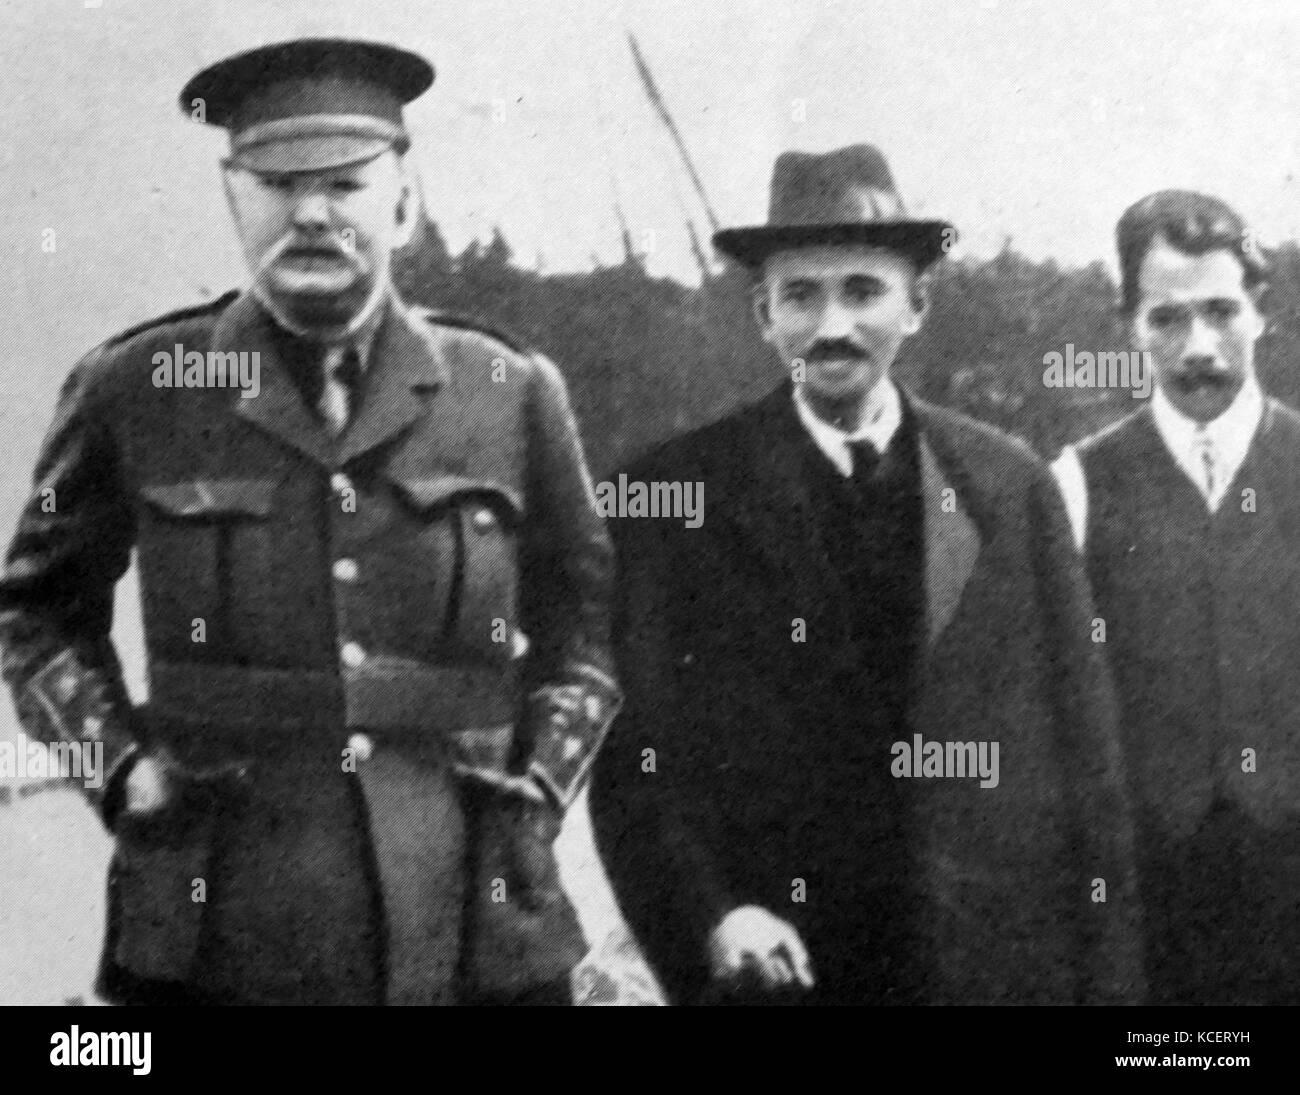 Mohandas Karamchand Gandhi visits England 1914. Gandhi established an idealistic community called 'Tolstoy Farm' Stock Photo